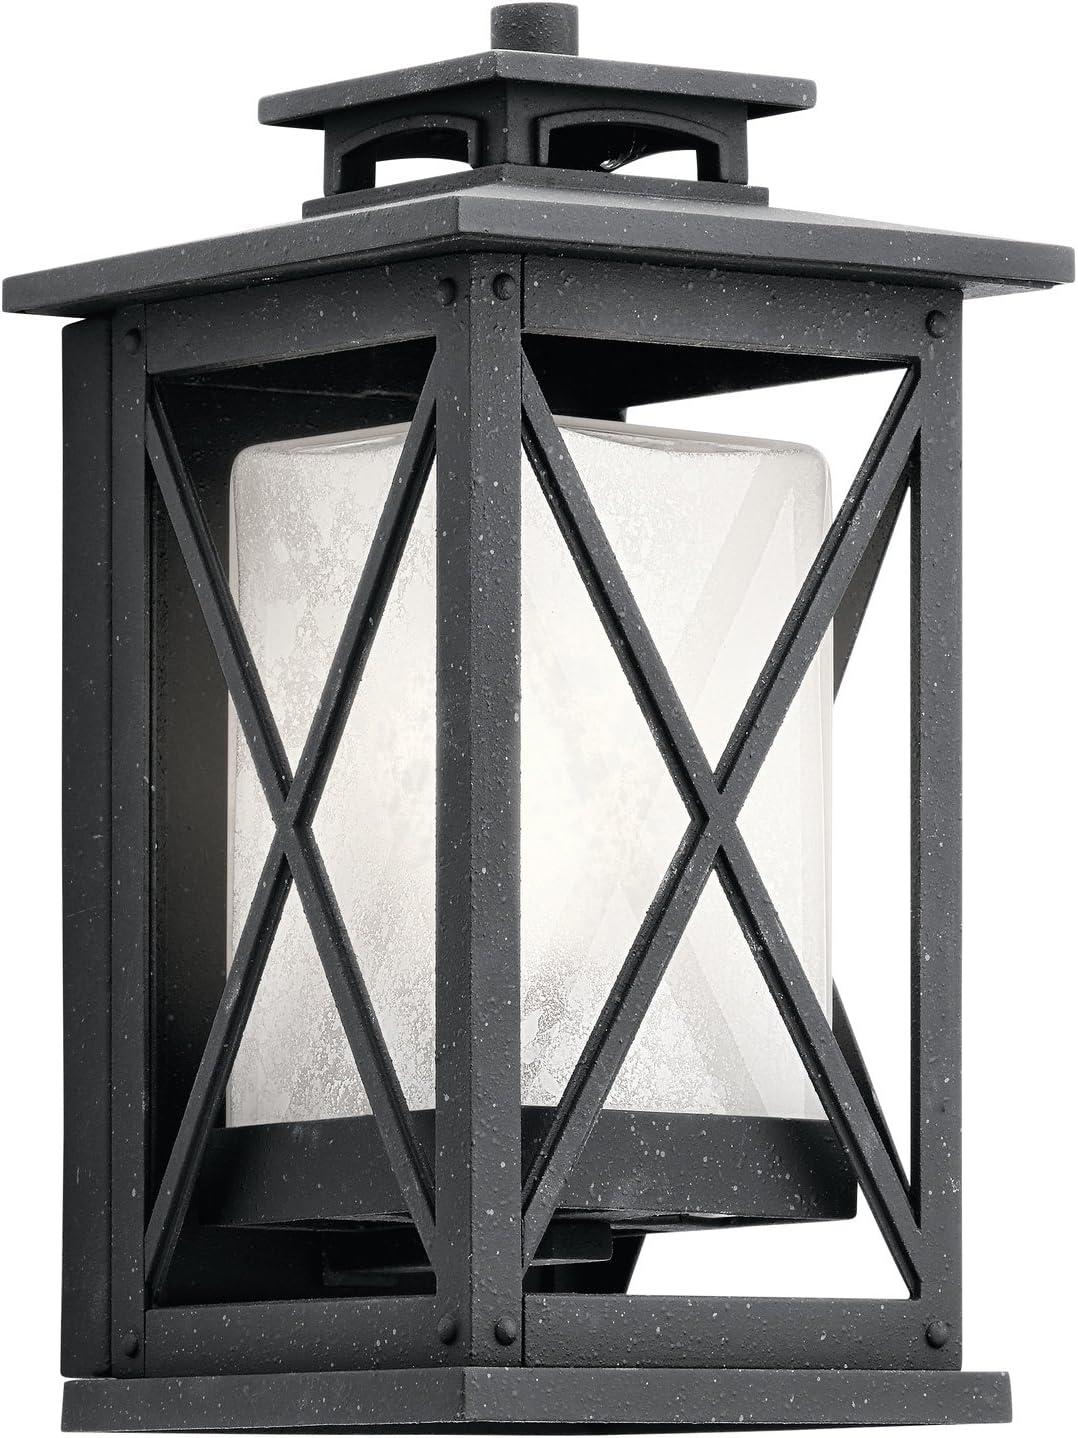 Kichler 9708BK Mount Vernon Outdoor Wall Sconce 1 Light Incandescent 150 Watts Black